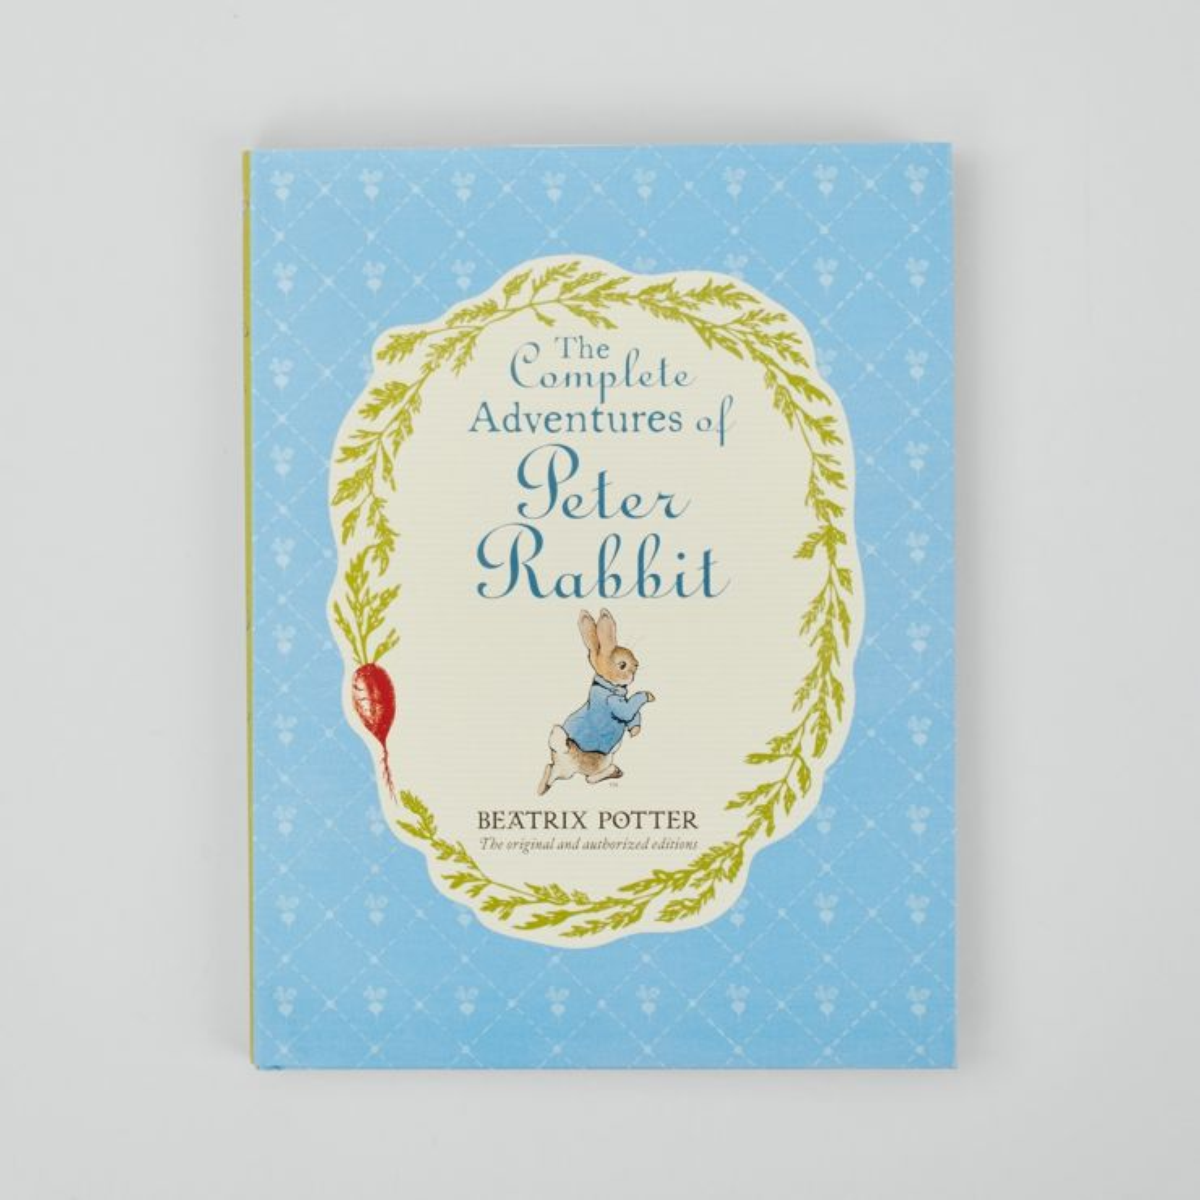 Personalised The Complete Adventures of Peter Rabbit Hardback Book